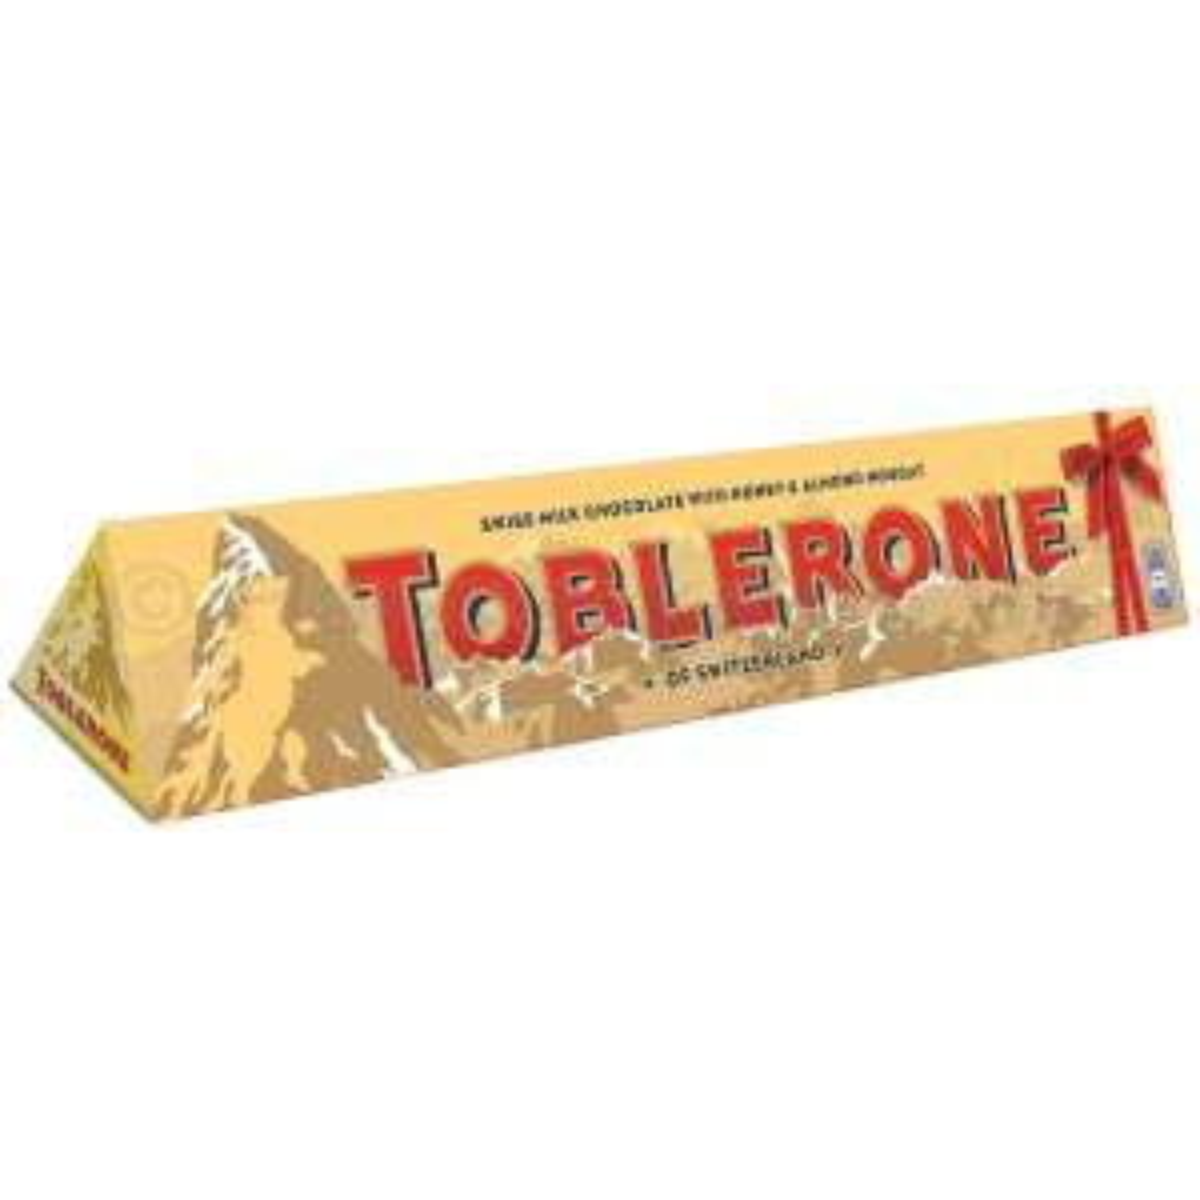 Toblerone 750g £2.50 Instore @ Asda (Llanelli)